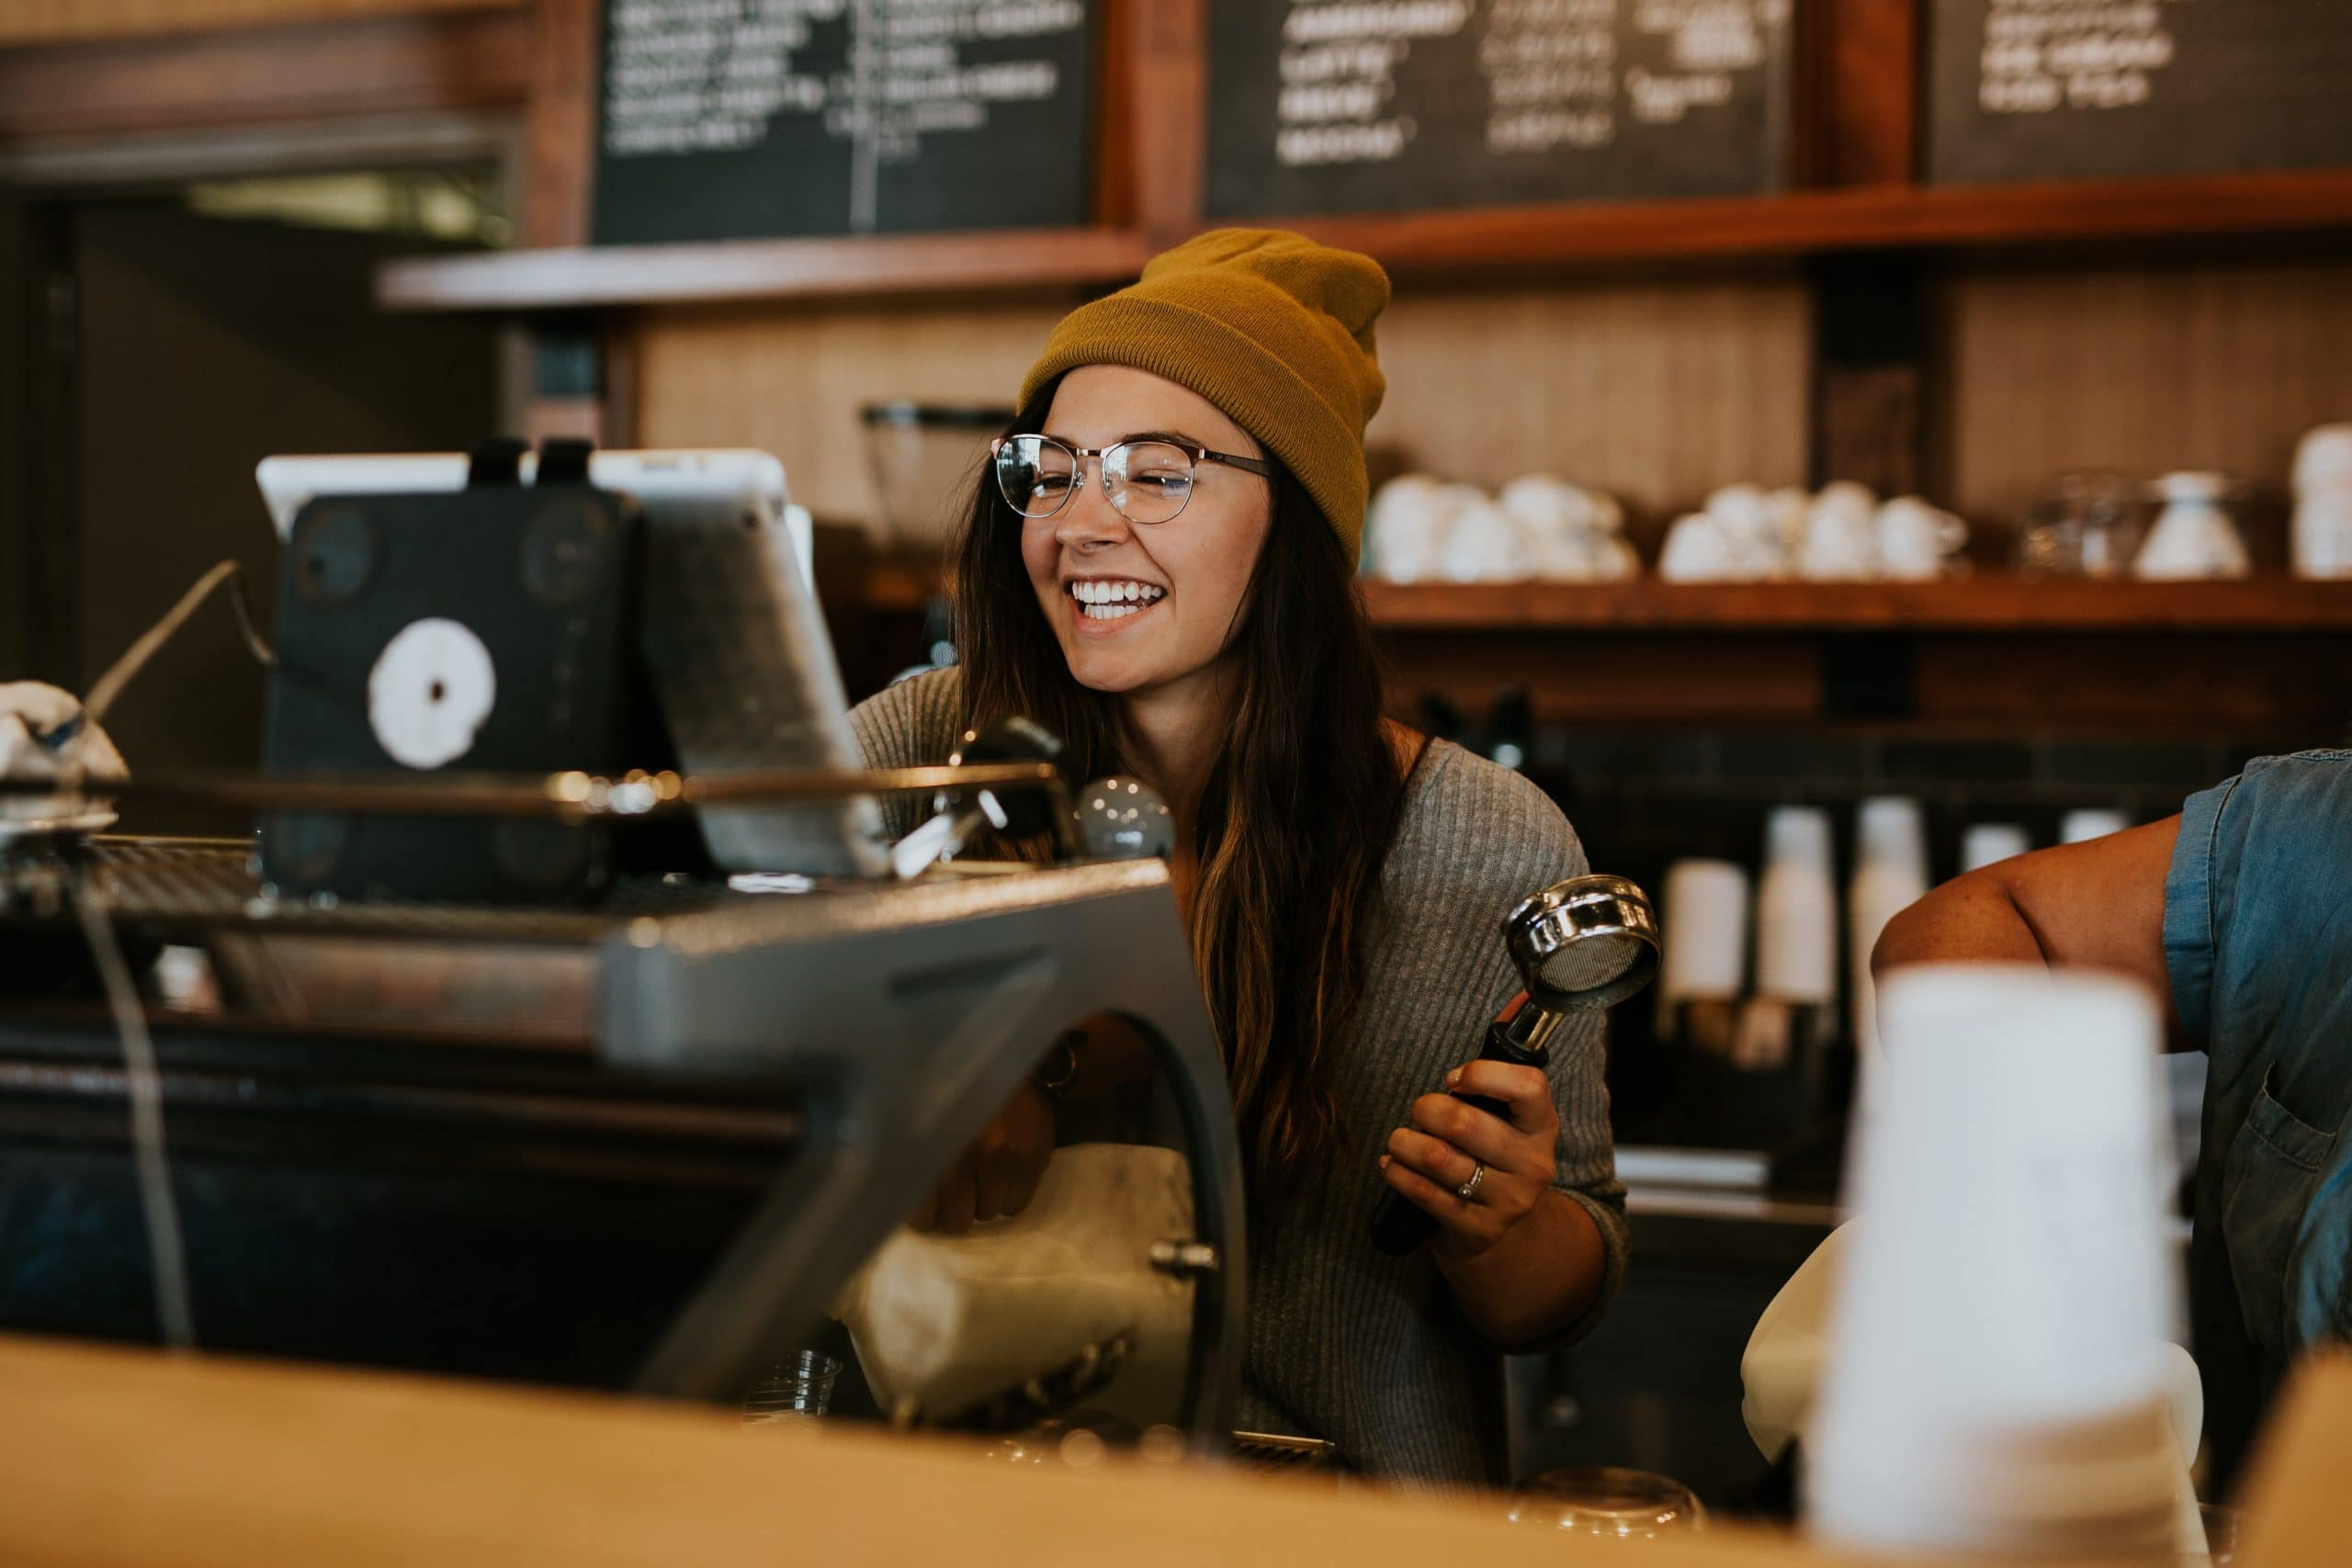 Barrister making coffee